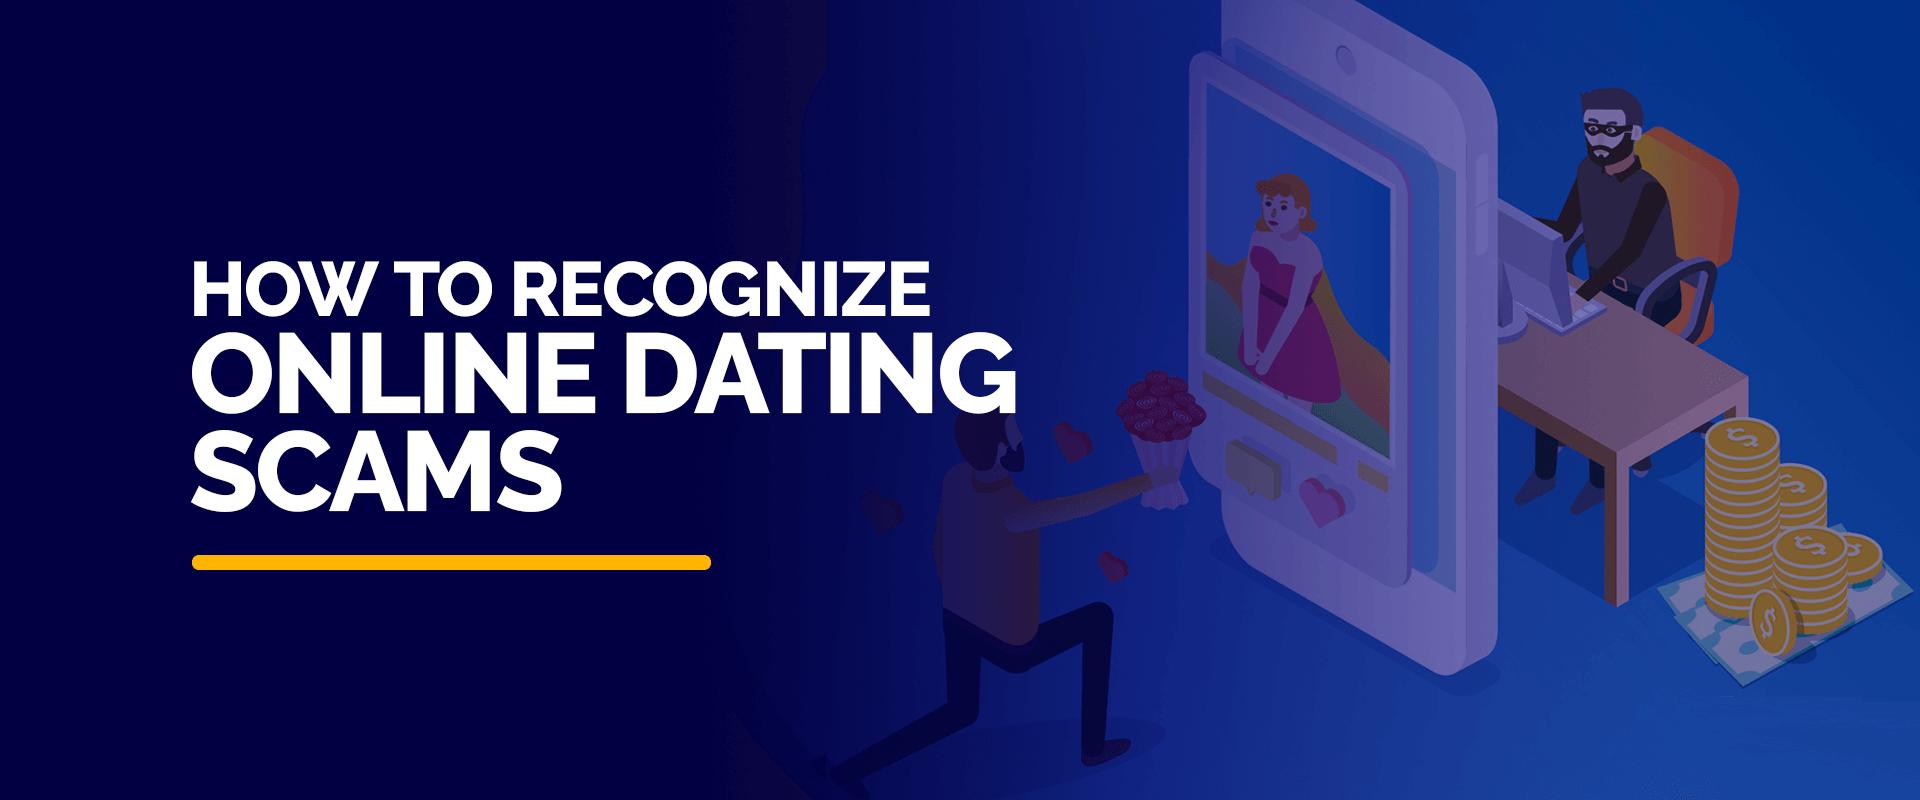 Internet dating fraud+stories